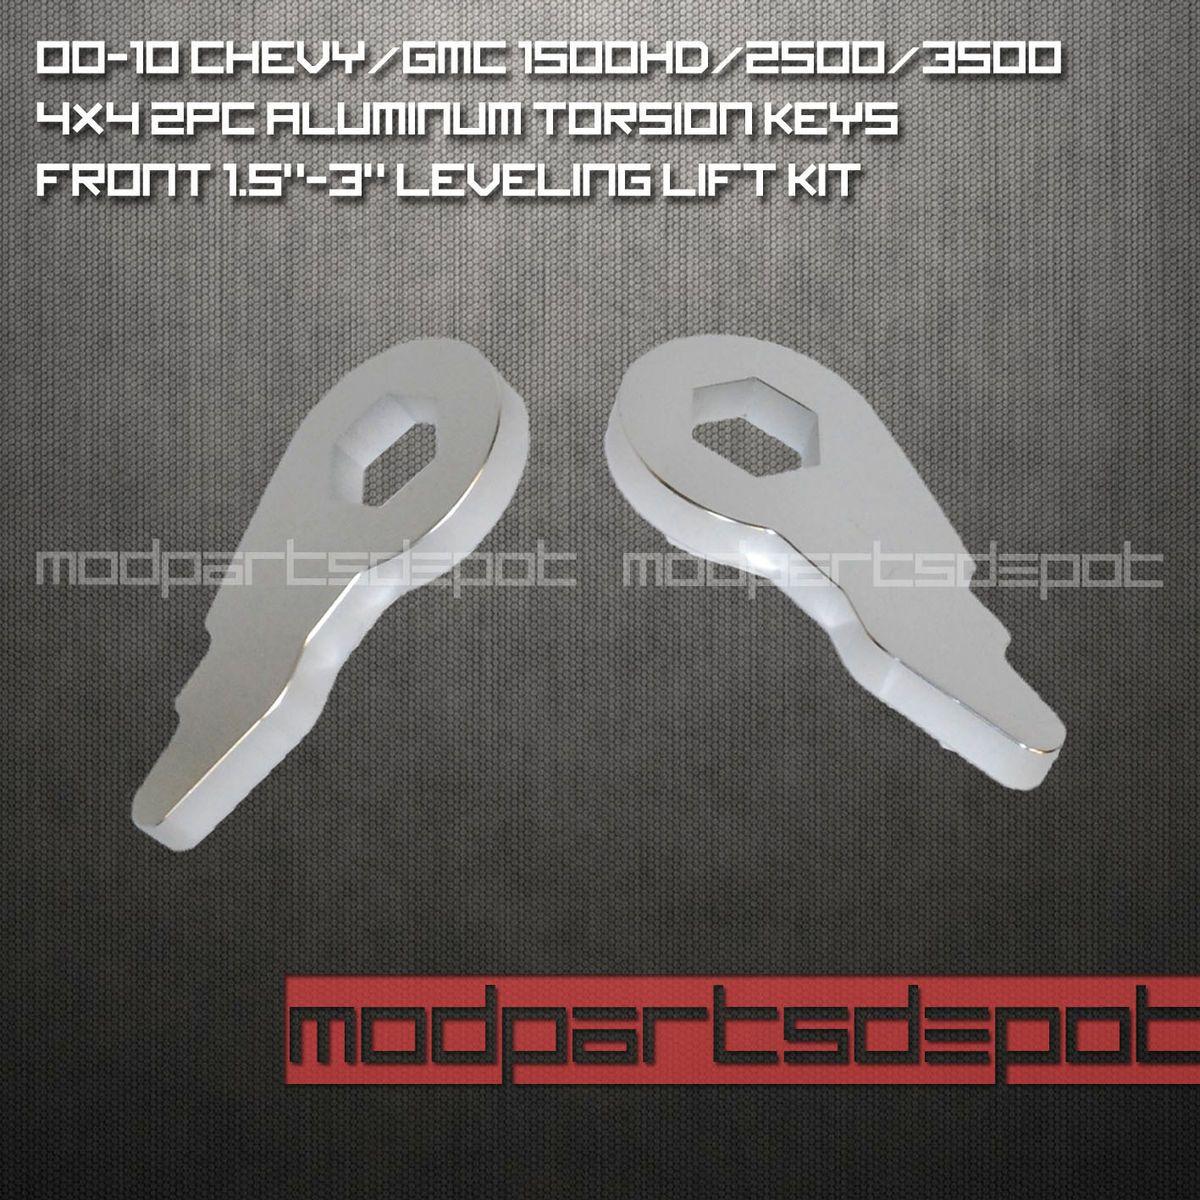 00 10 Chevy Silverado GMC Sierra 1500HD 2500 3500 FRONT Leveling Lift